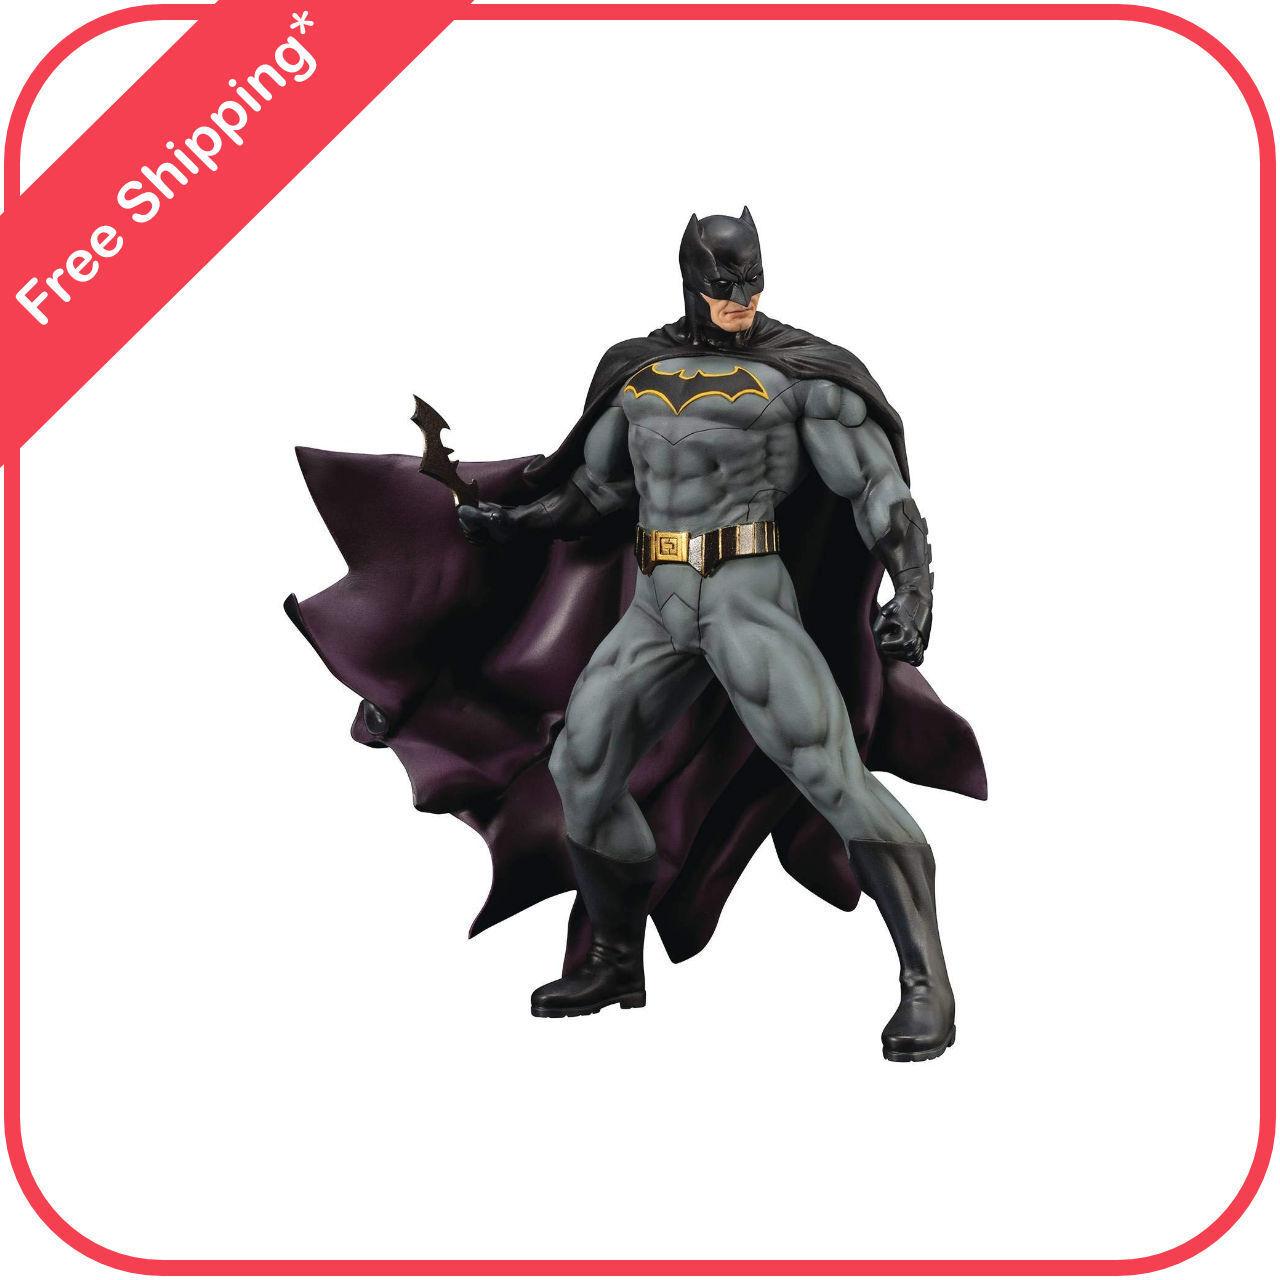 DC Comics Batman Rebirth ArtFX+ Figure Statue by Kotobukiya